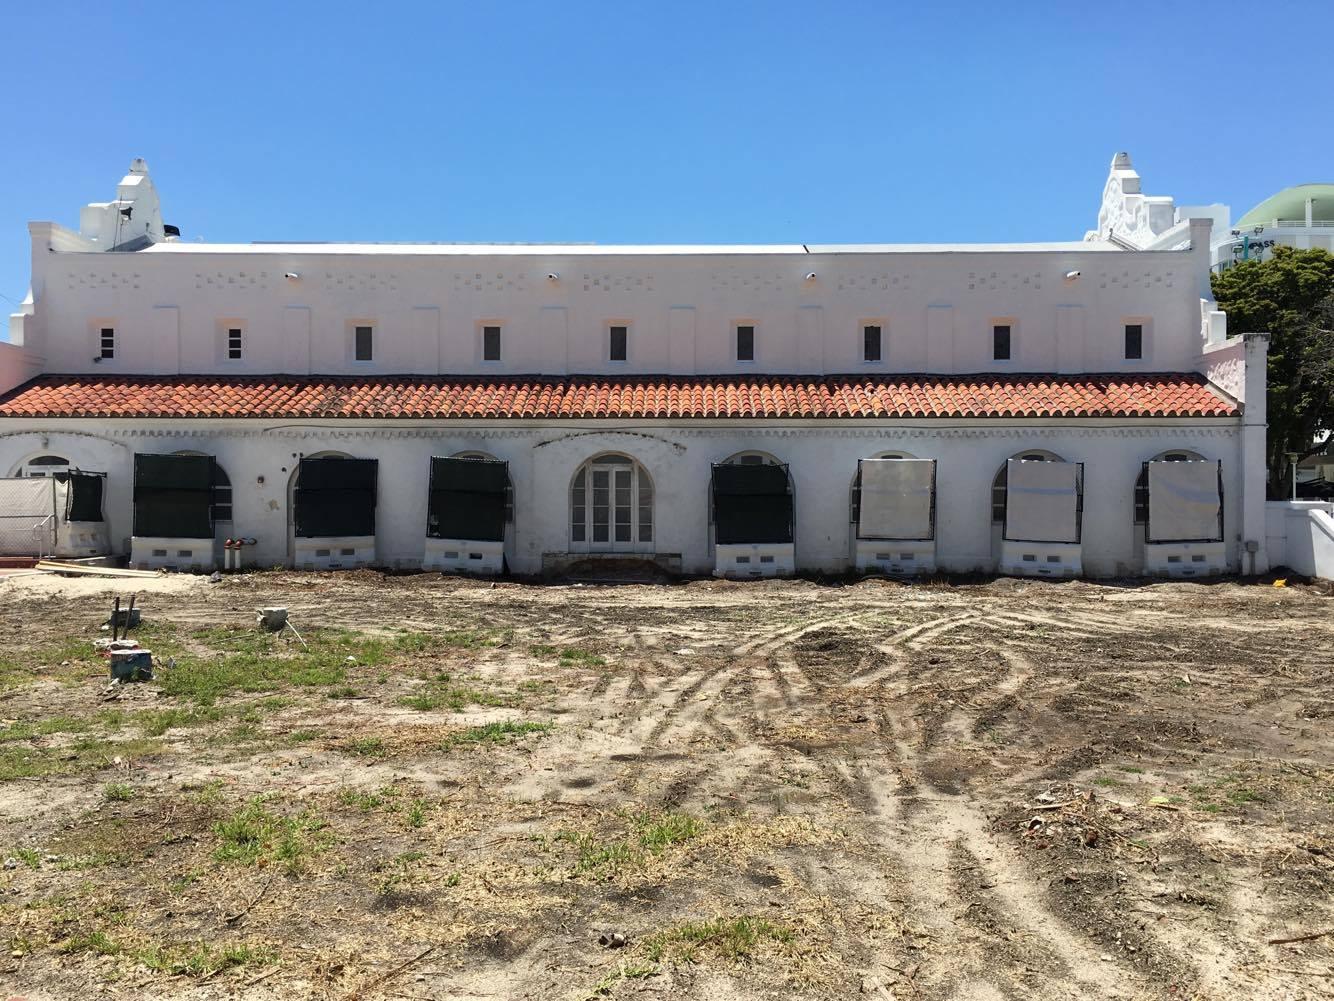 Miami Beach Community Church demolition. Photos by Phillip Pessar.